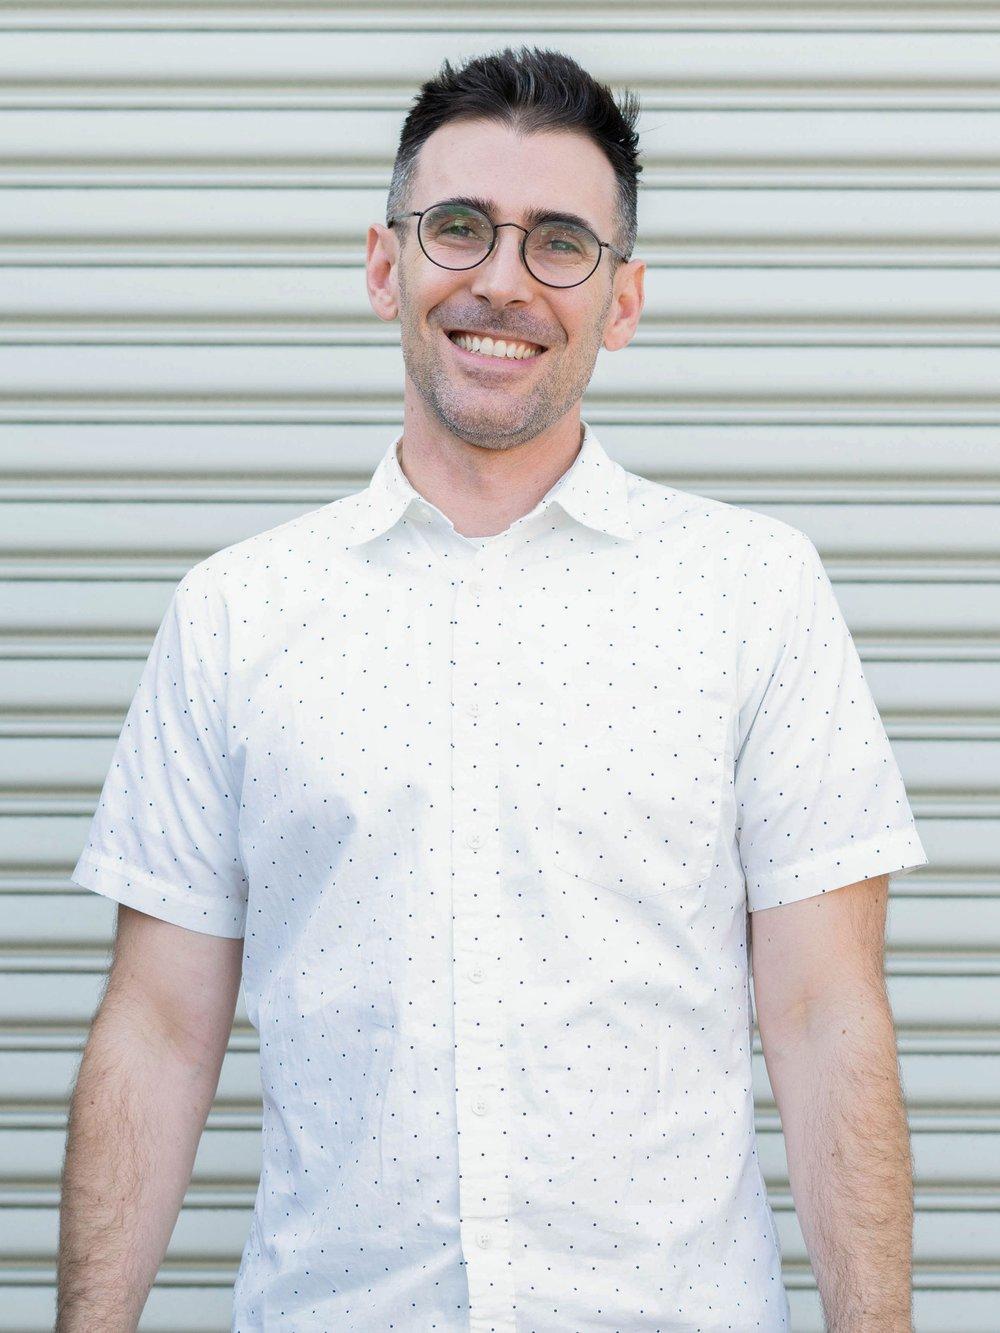 JESSE NICELY - Director, Creative StrategyAbout Jesse